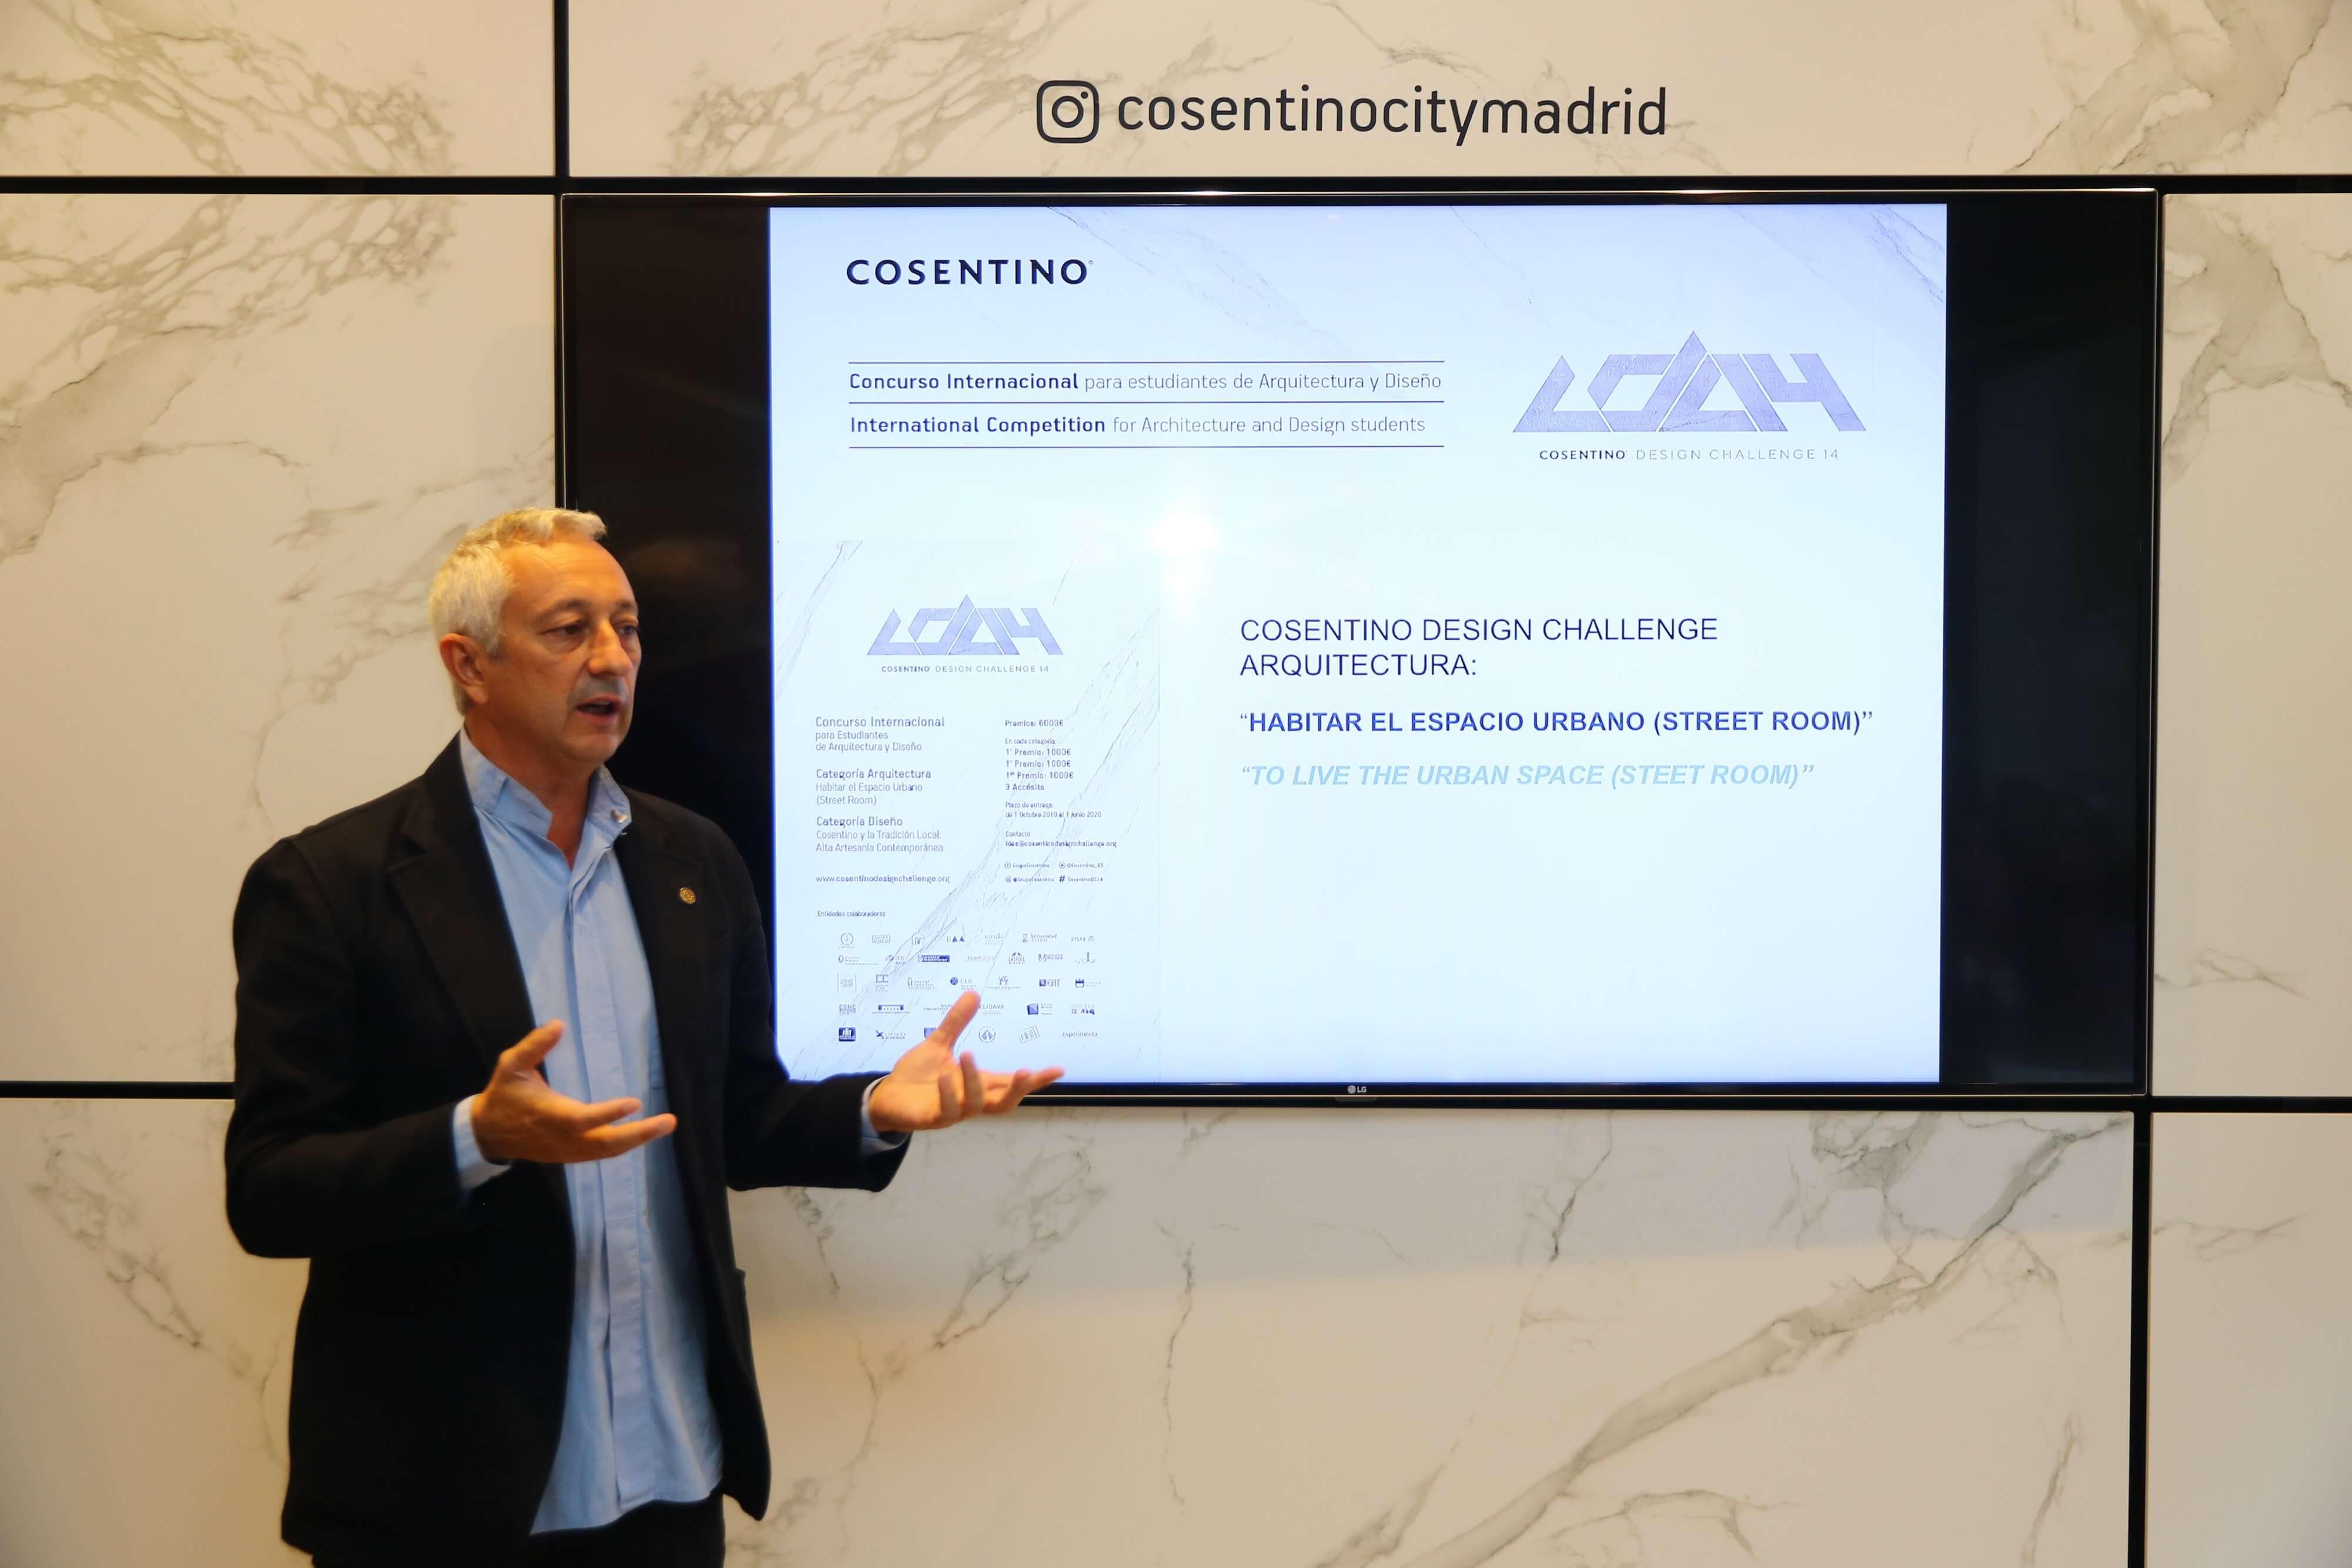 Cosentino apresenta 14ª edição do Cosentino Design Challenge